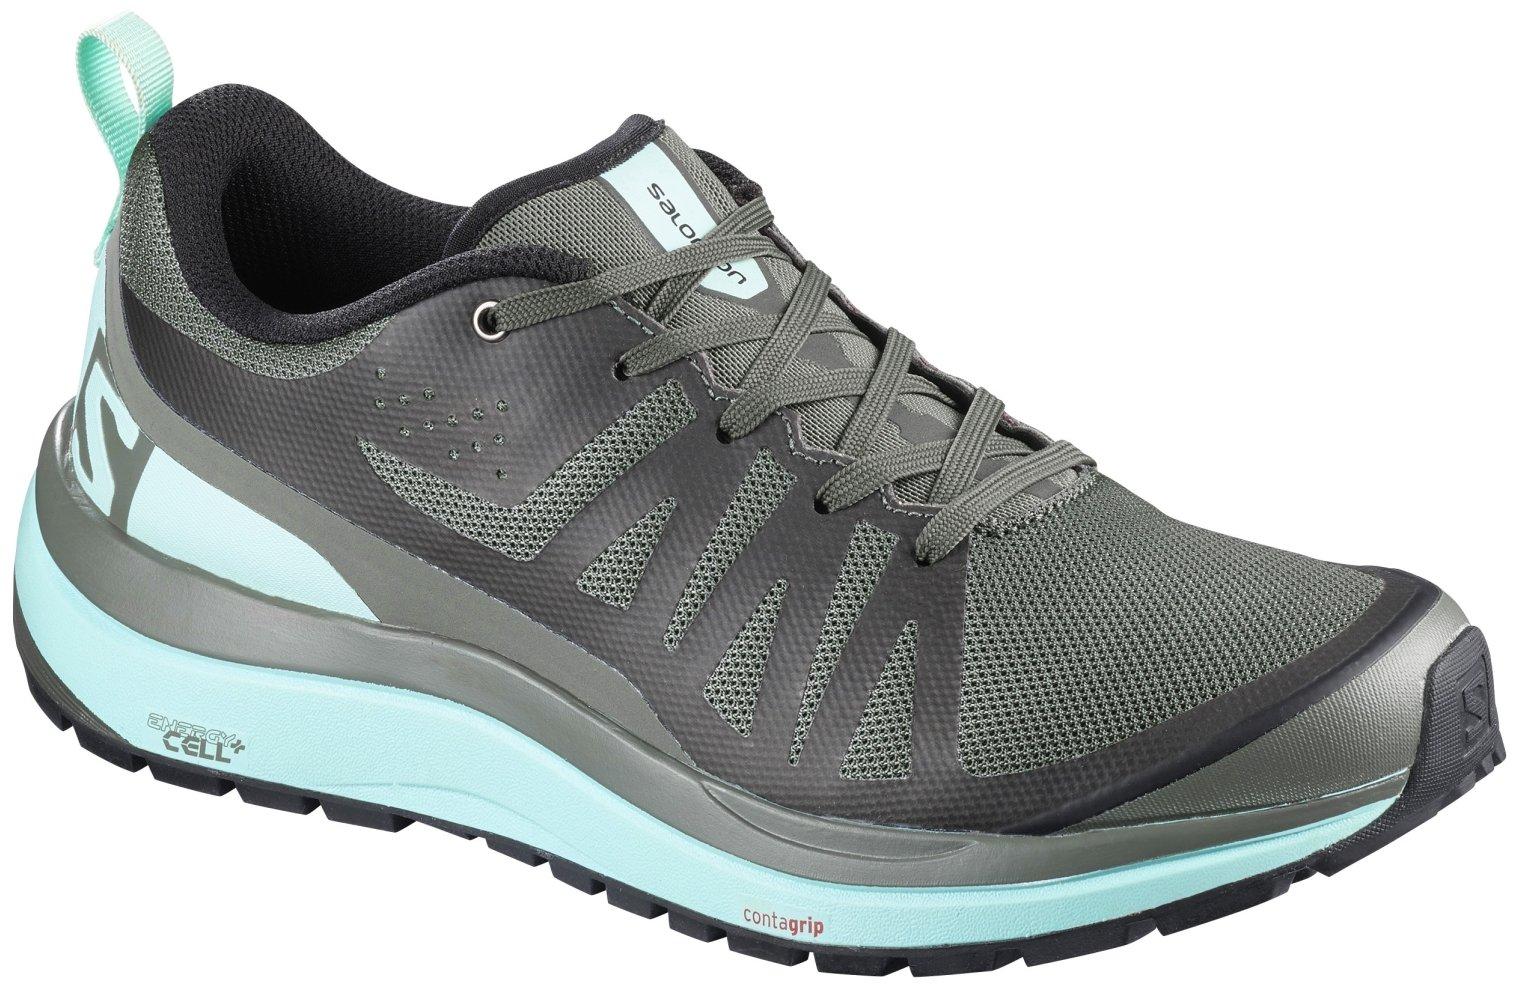 Salomon Women's Odyssey Pro Low Hiking Shoes Castor Gray/Eggshell Black 6.5